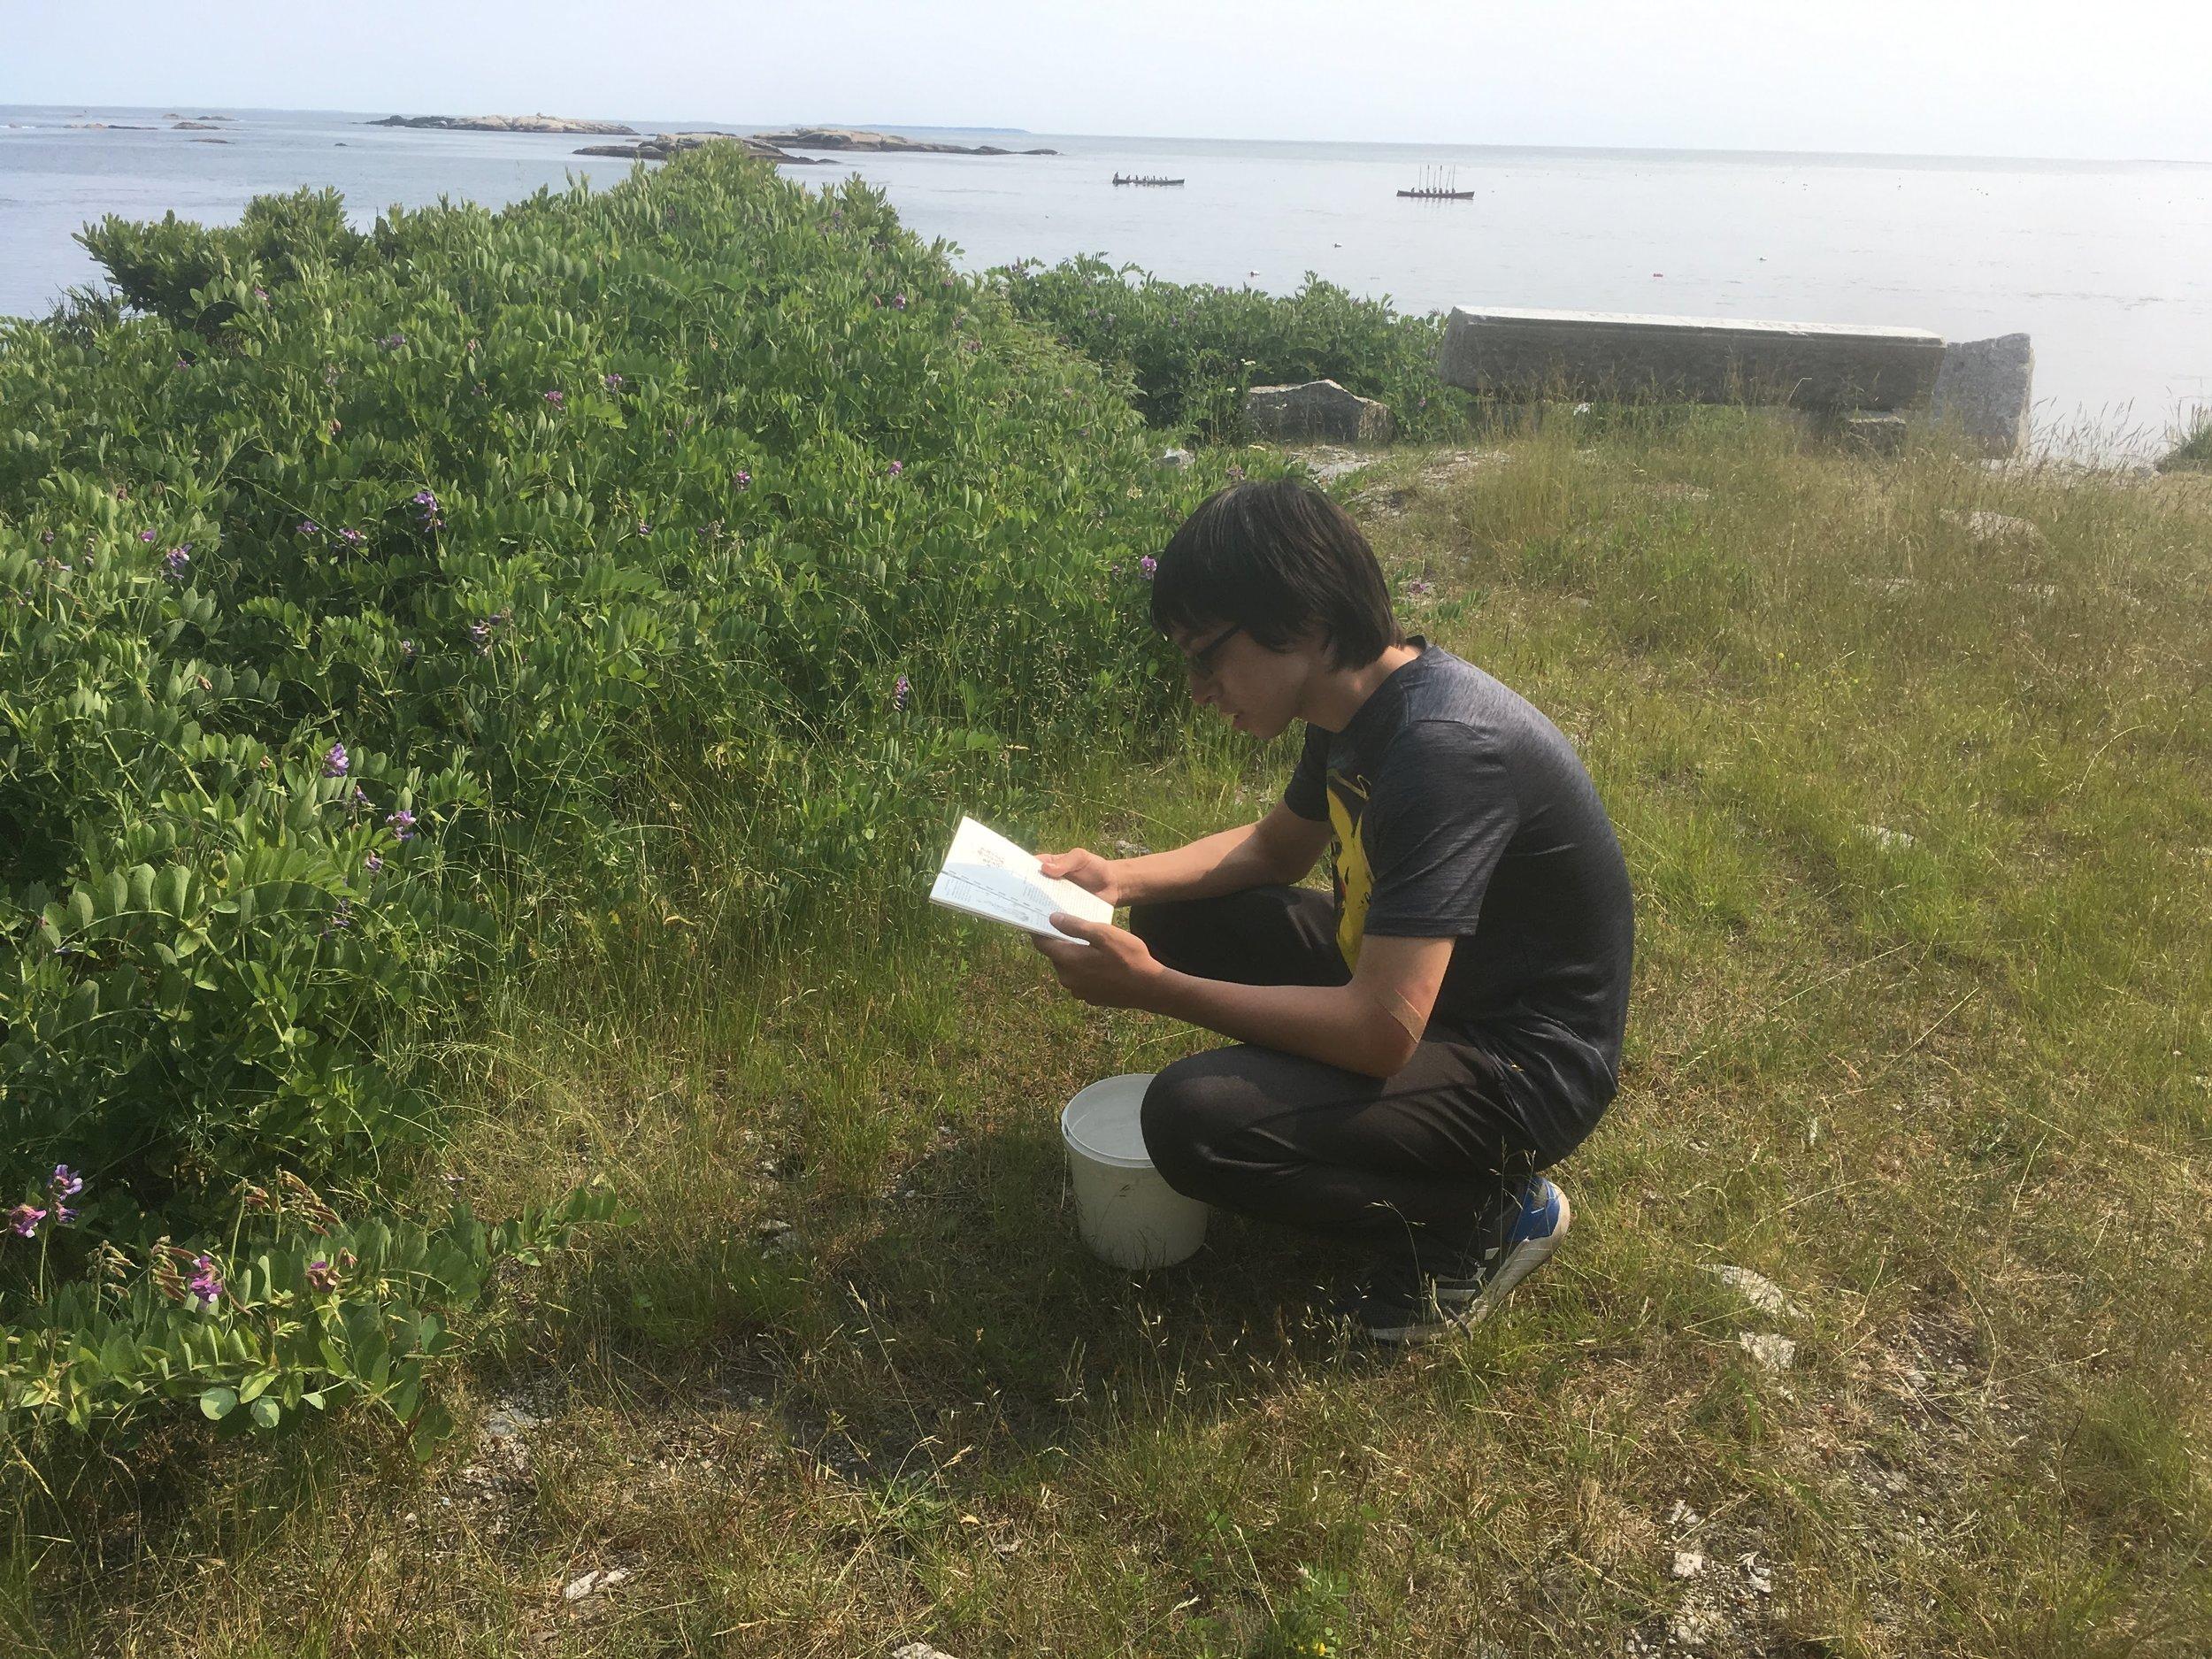 A positive field guide identification: beach peas - yum!